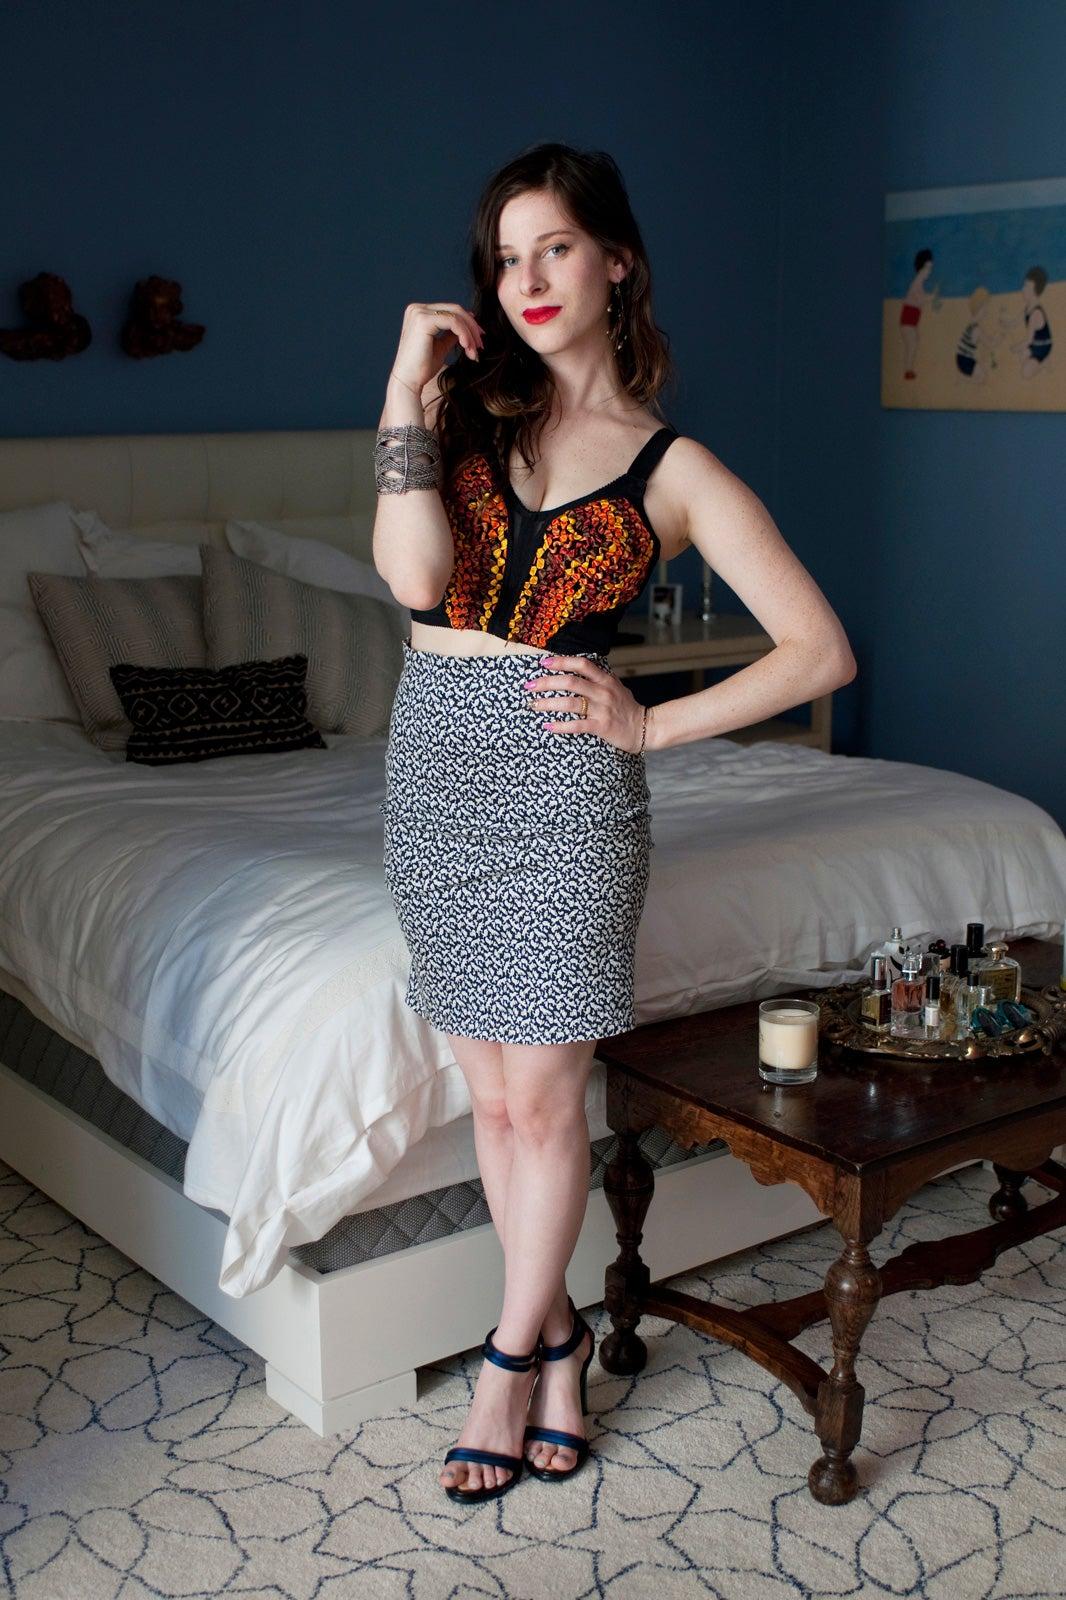 sasha spielberg interview and photos